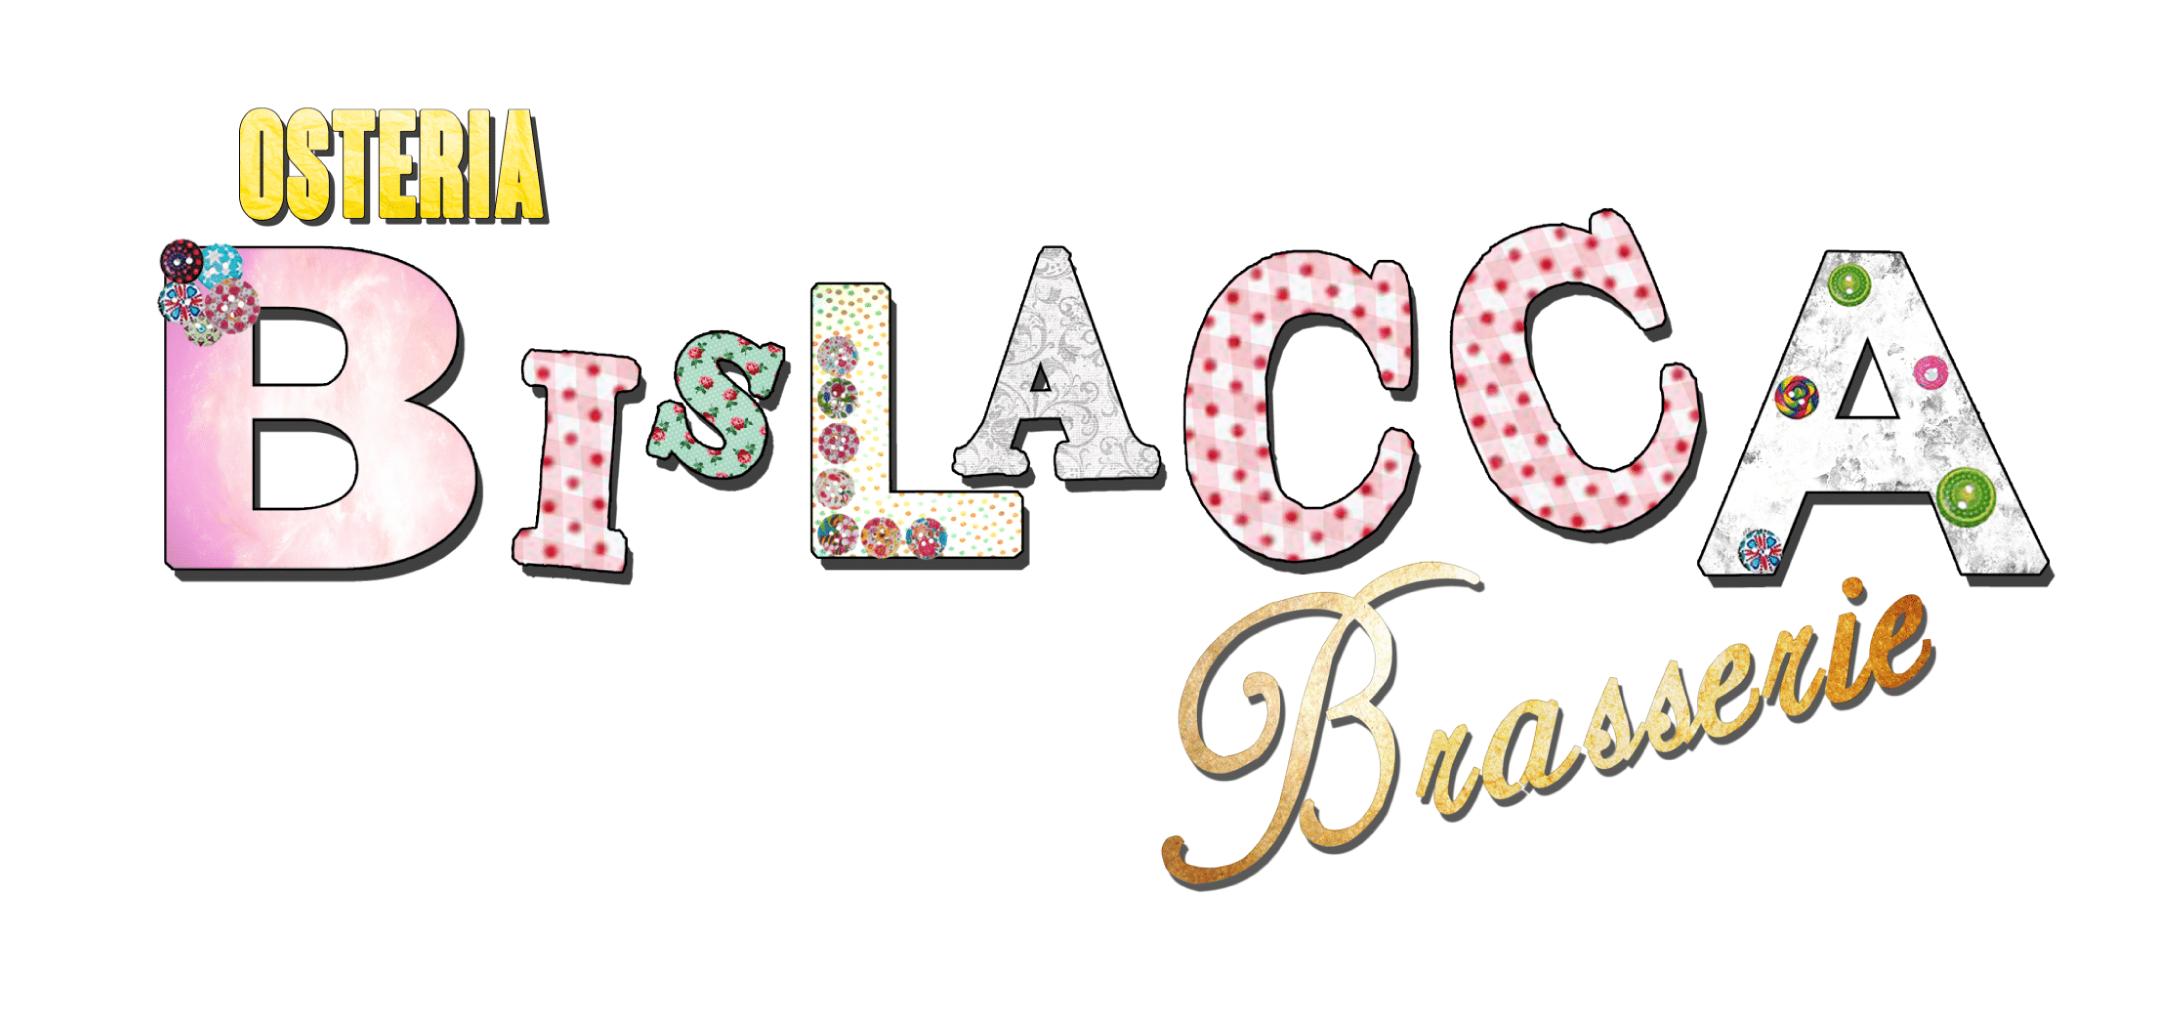 Osteria bislacca- logo